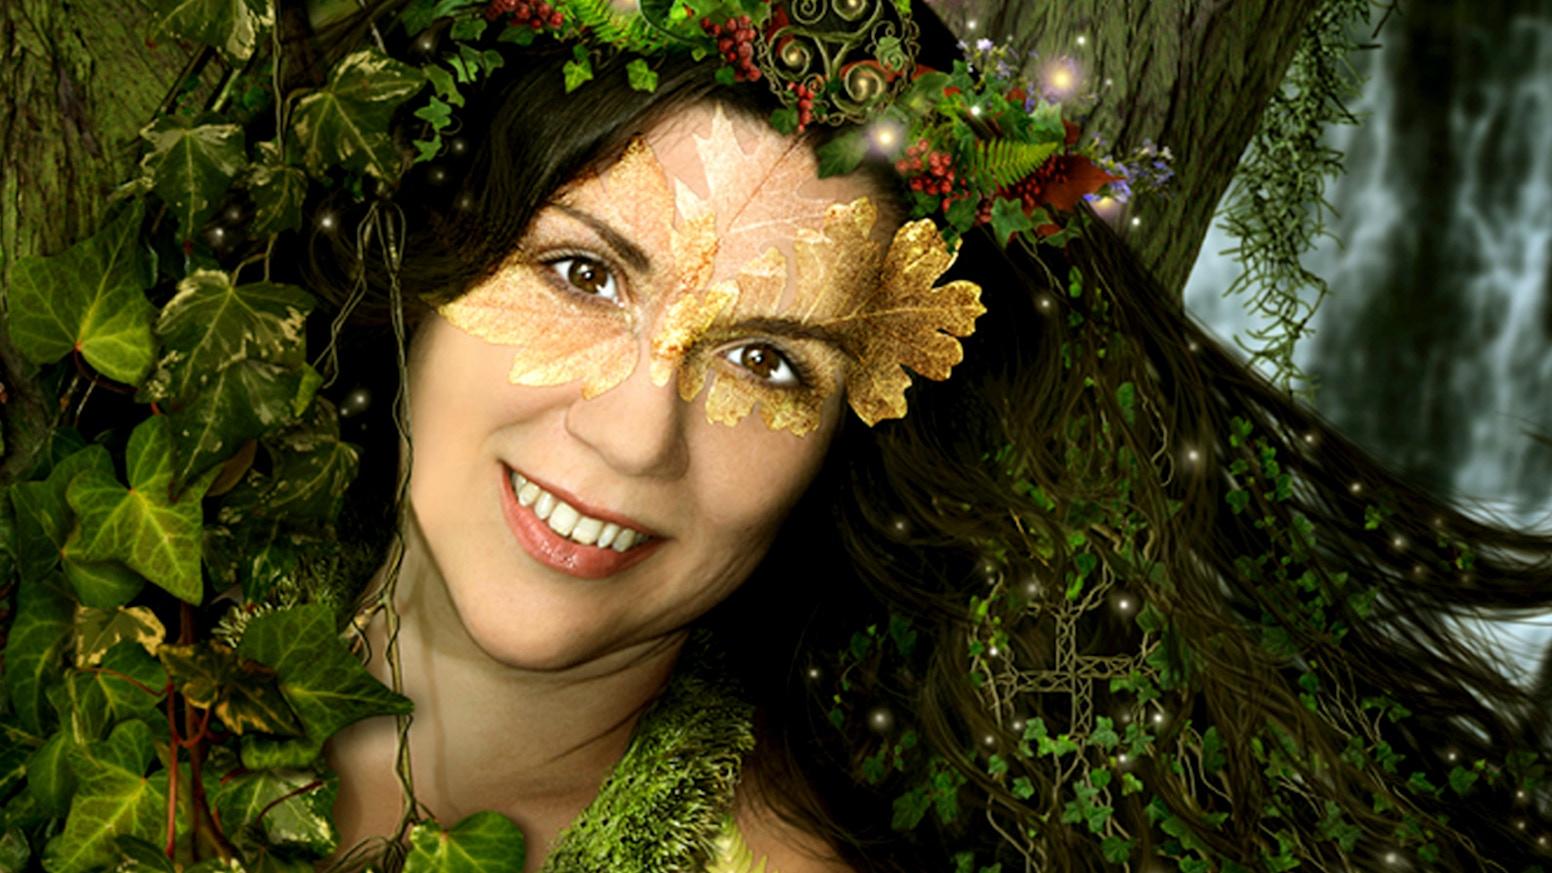 Jenna Greene ~ Wild Earth Child ~ a new CD of healing music by Jenna